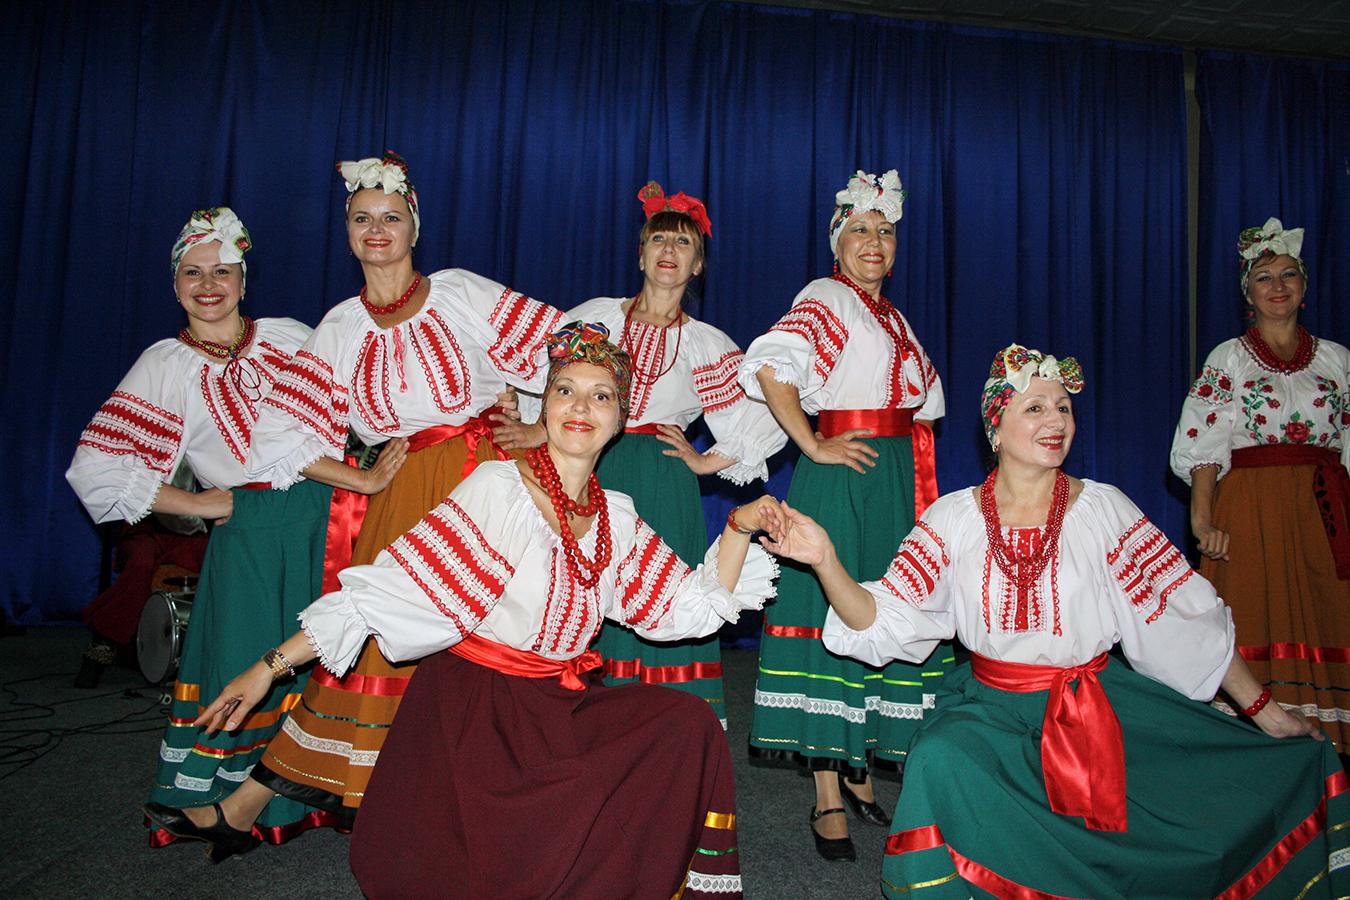 ucraina-spectacol-m-kogalniceanu